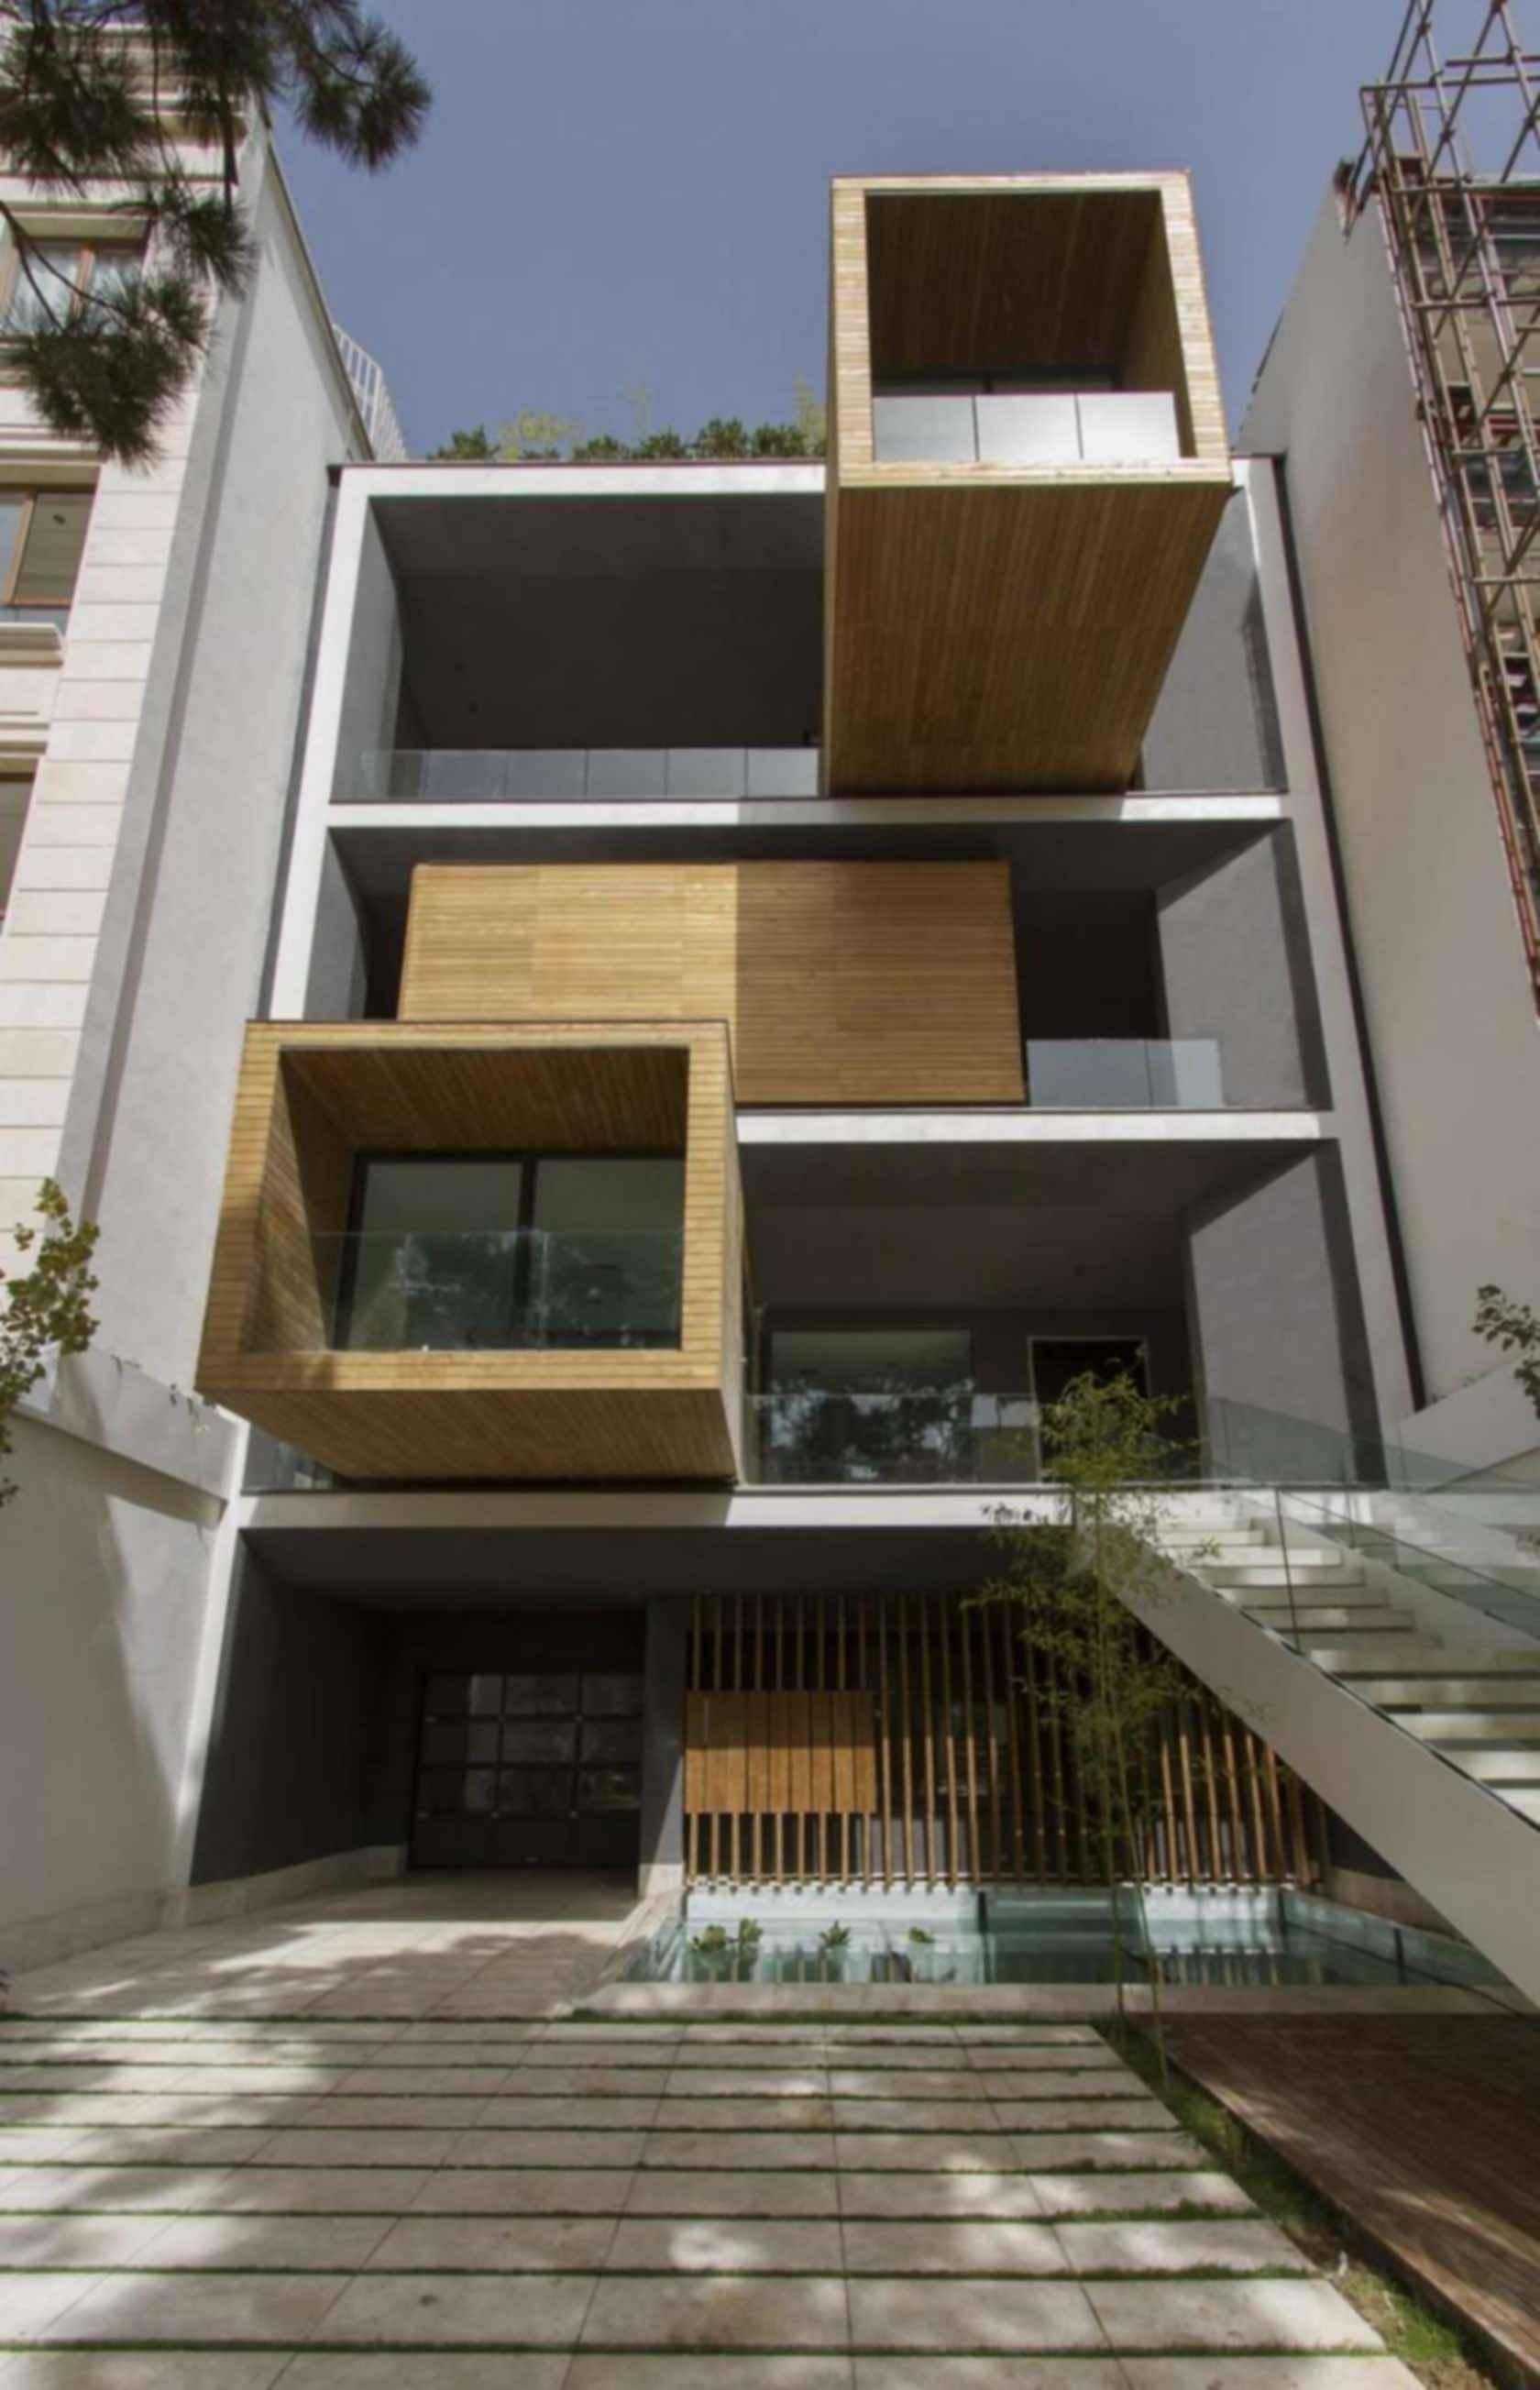 Sharifi-ha: The Transforming House - Exterior